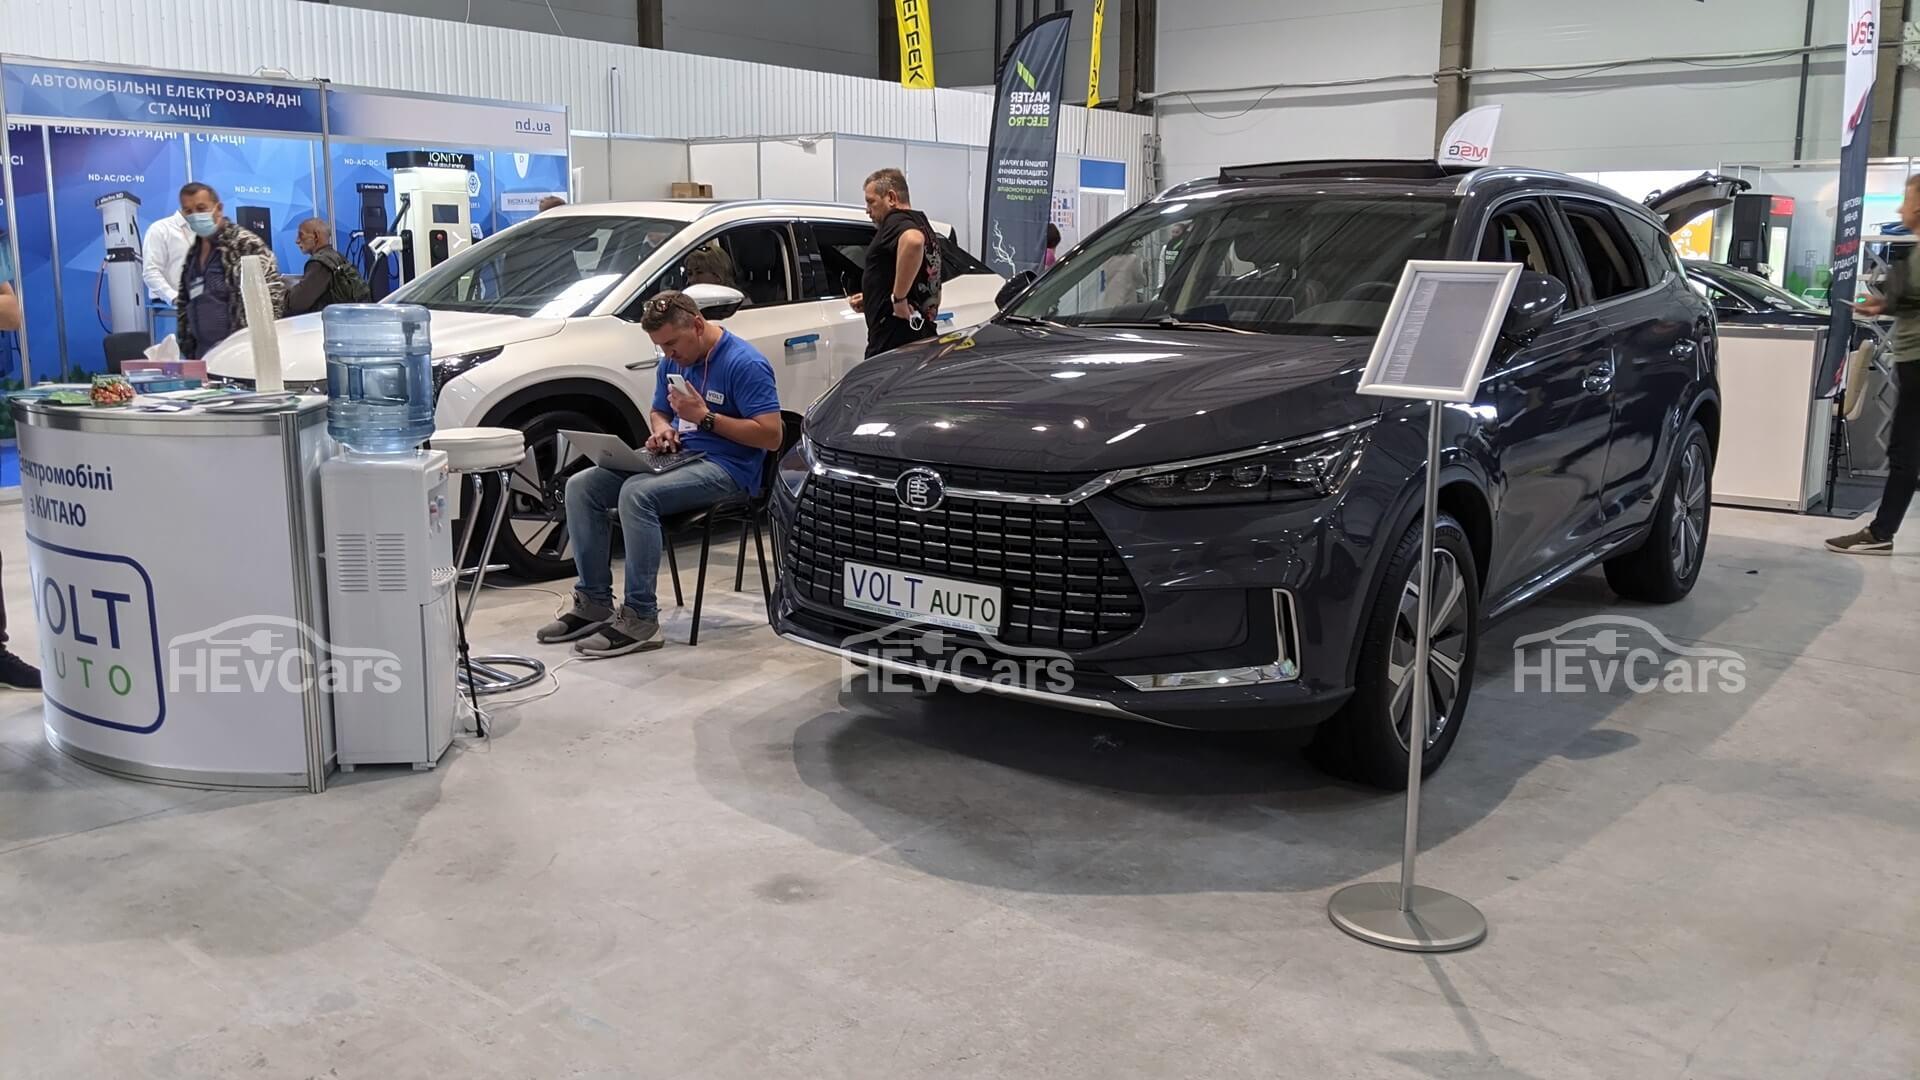 Дилер новых электромобилей изКитая VOLTauto на выставке Plug-In Ukraine 2021